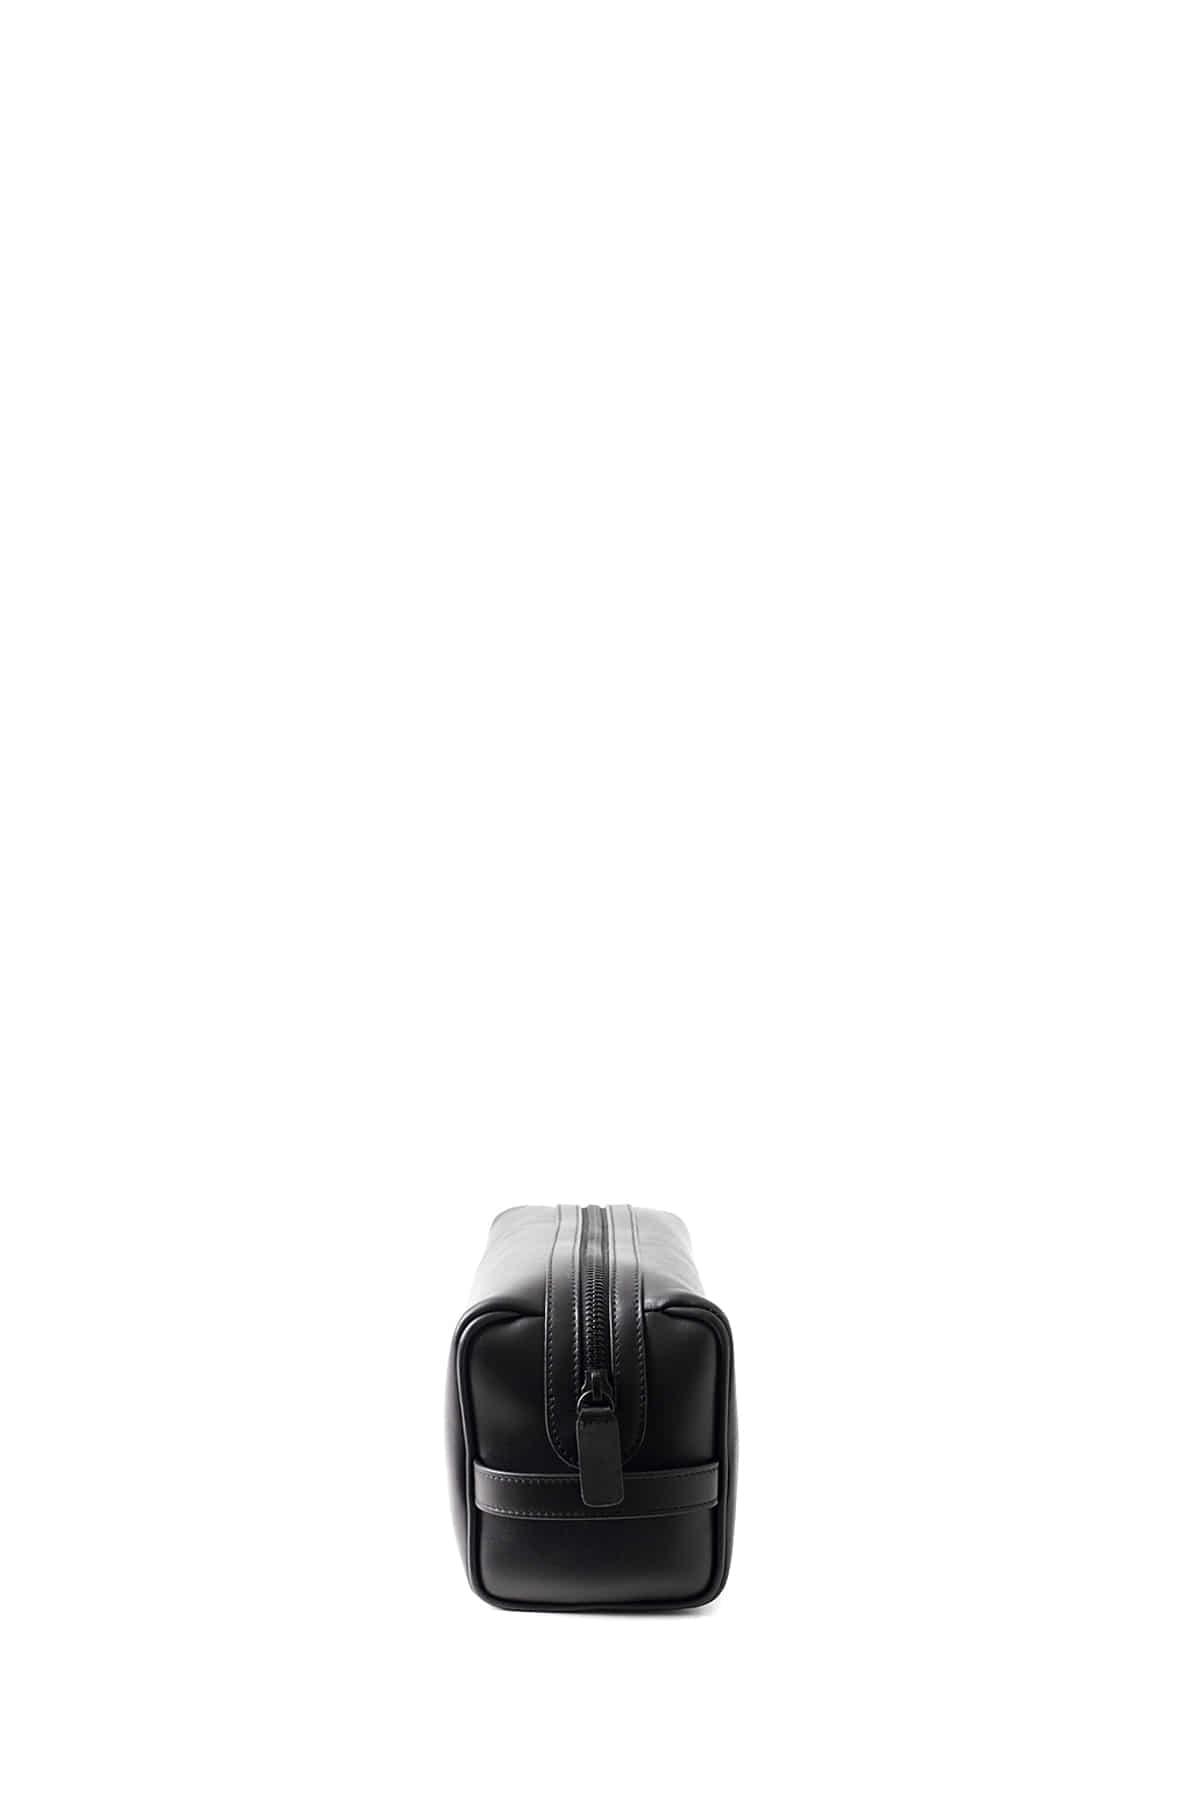 e8fa7f945c Common Projects   Toiletry Bag (Black) - IAMSHOP-ONLINE